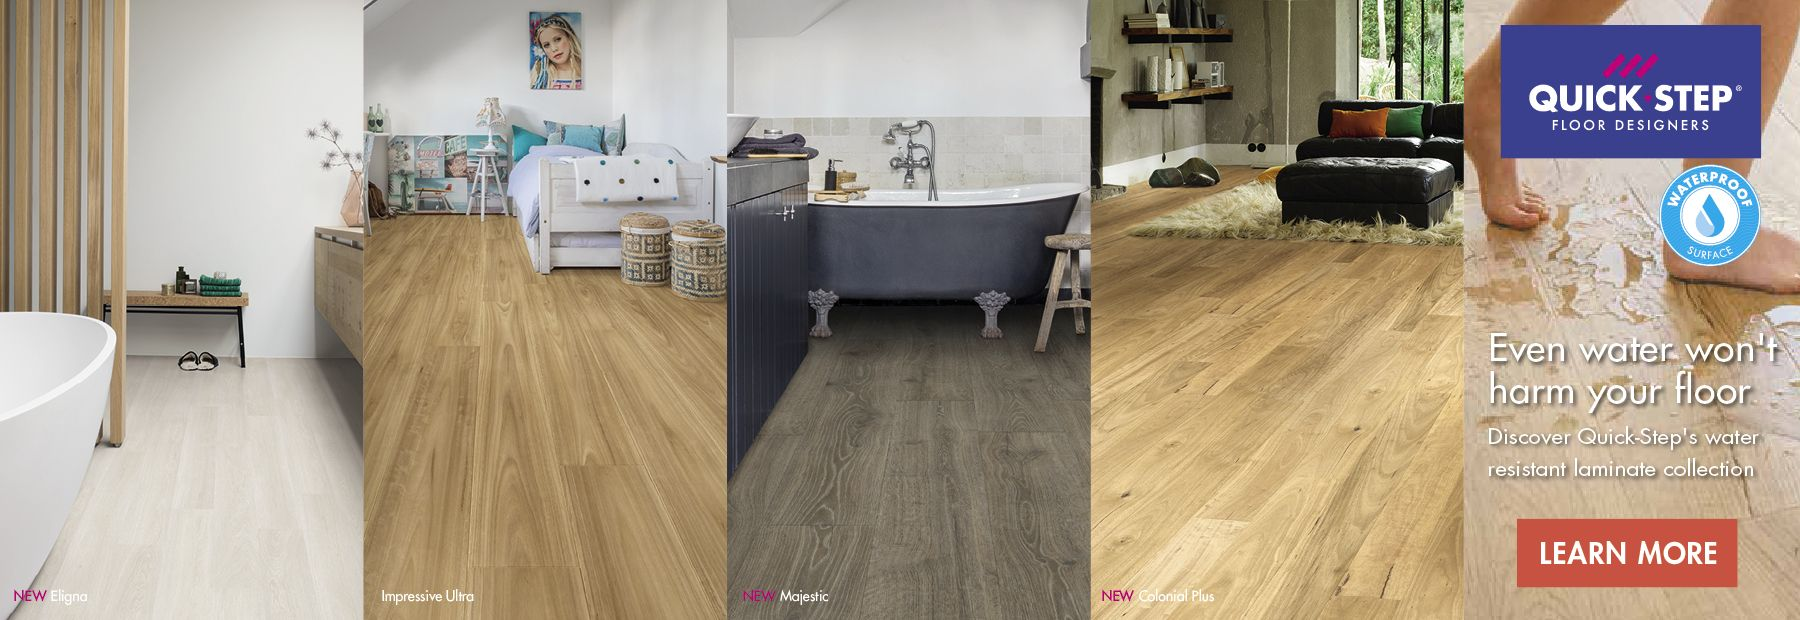 Carpet timber bamboo laminate oak vinyl flooring melbourne carpet timber bamboo laminate oak vinyl flooring melbourne hobart dailygadgetfo Choice Image